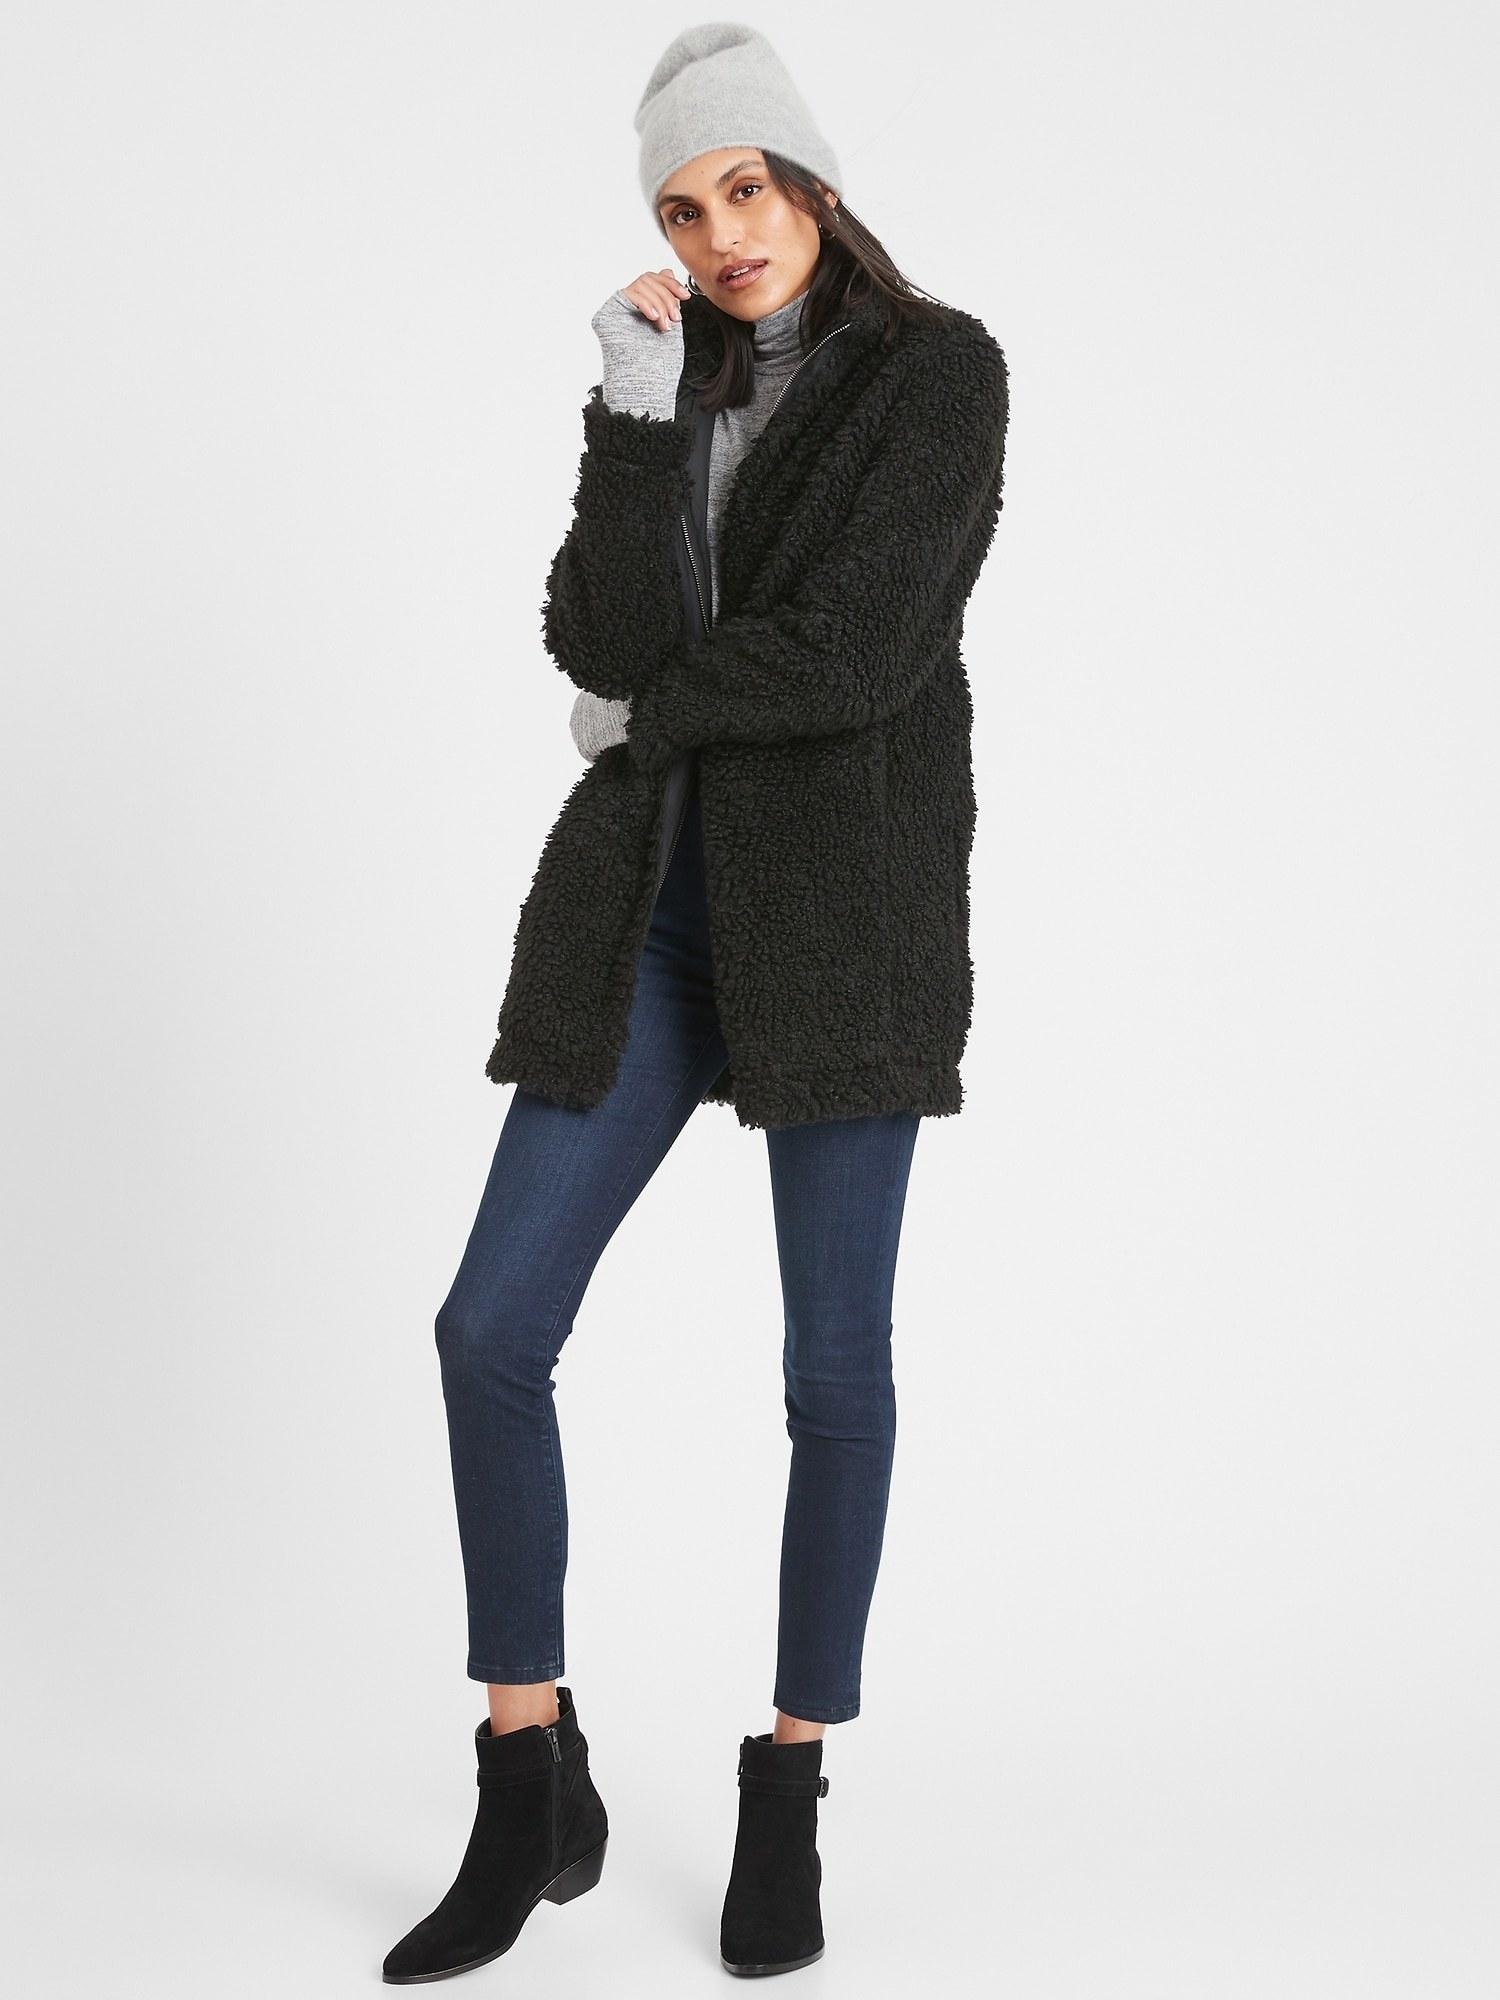 Model in the black hip-length zip-front jacket